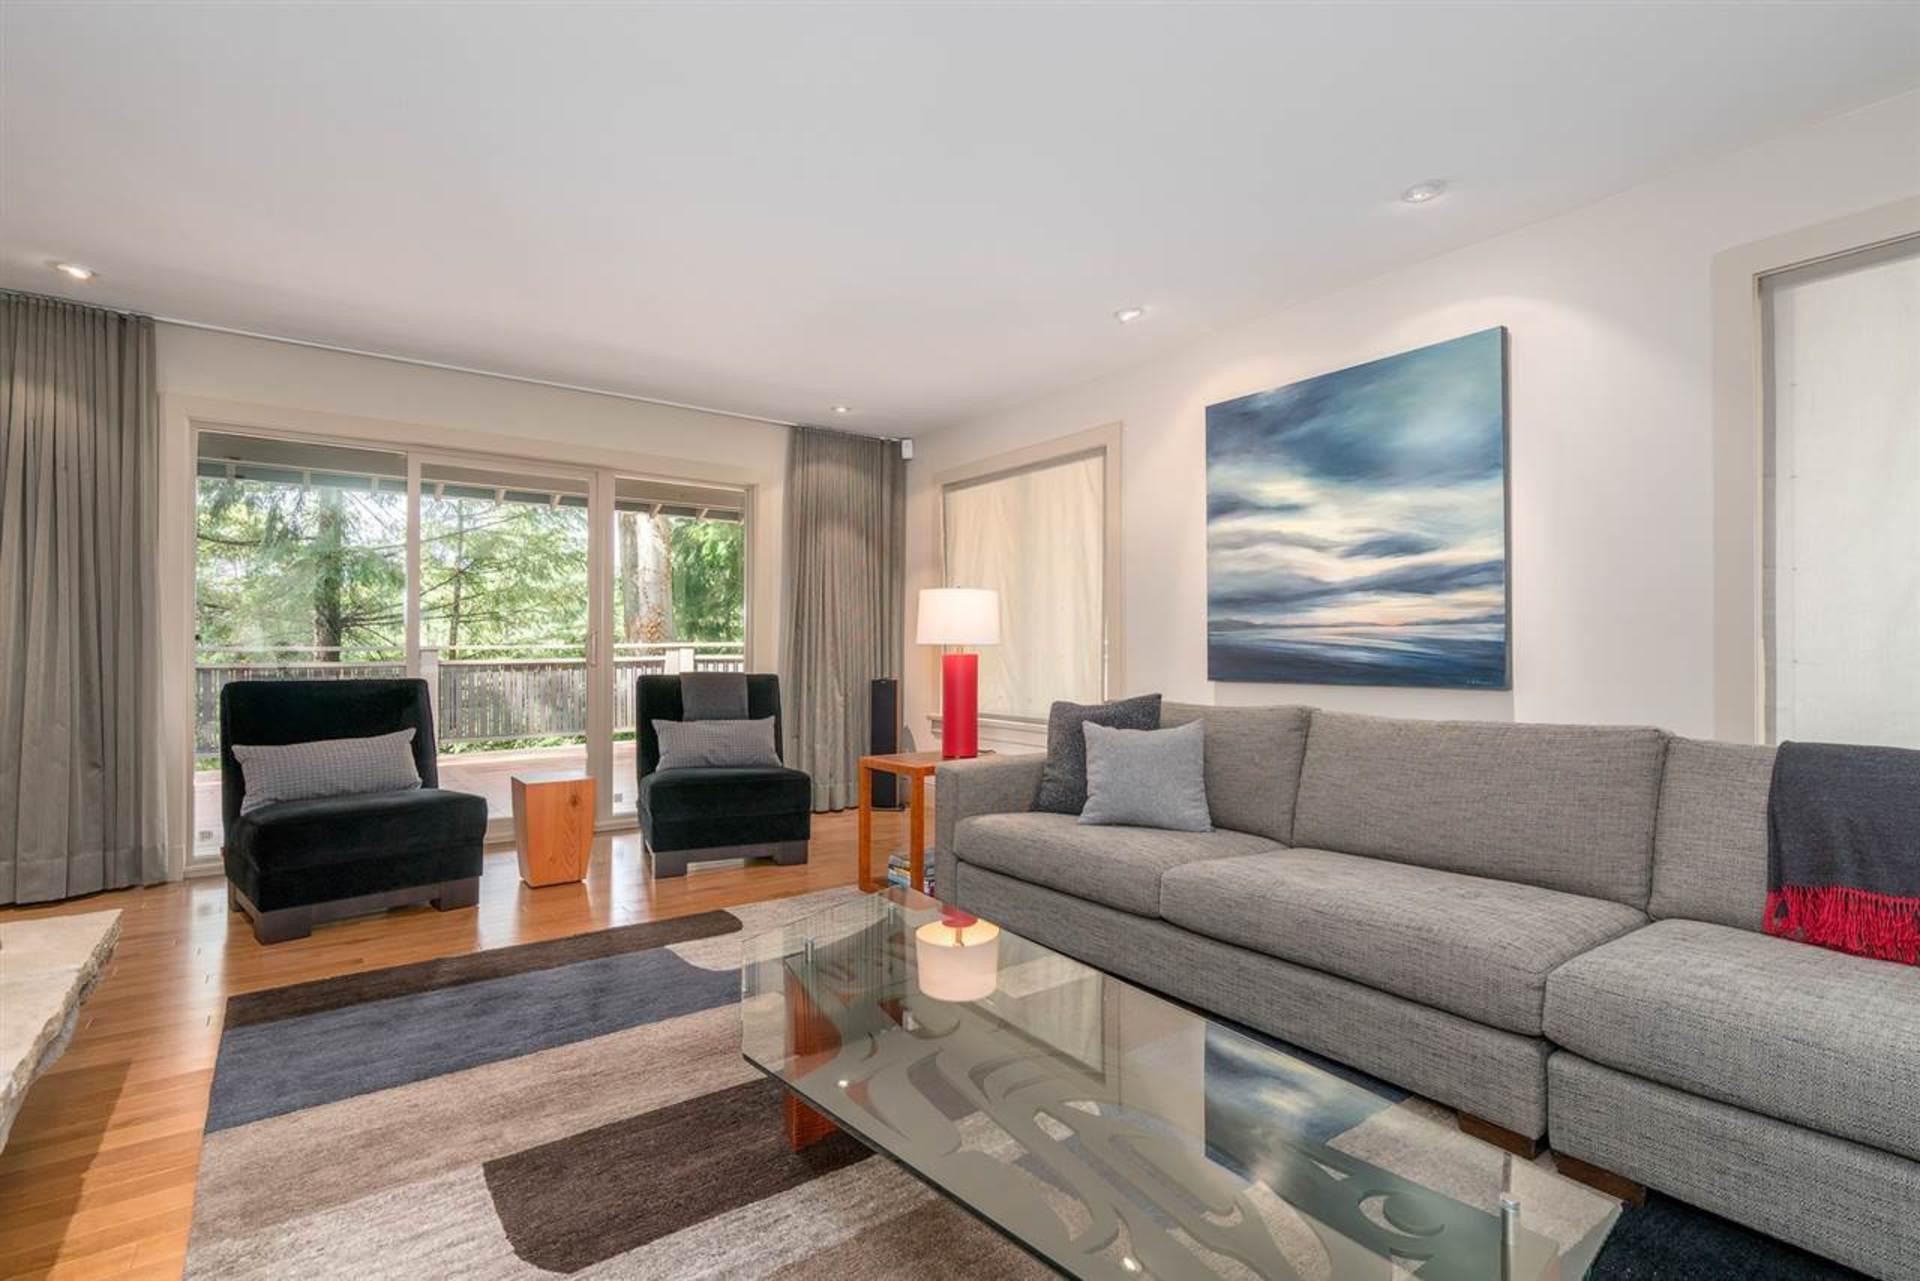 4620-woodburn-road-cypress-park-estates-west-vancouver-03 at 4620 Woodburn Road, Cypress Park Estates, West Vancouver